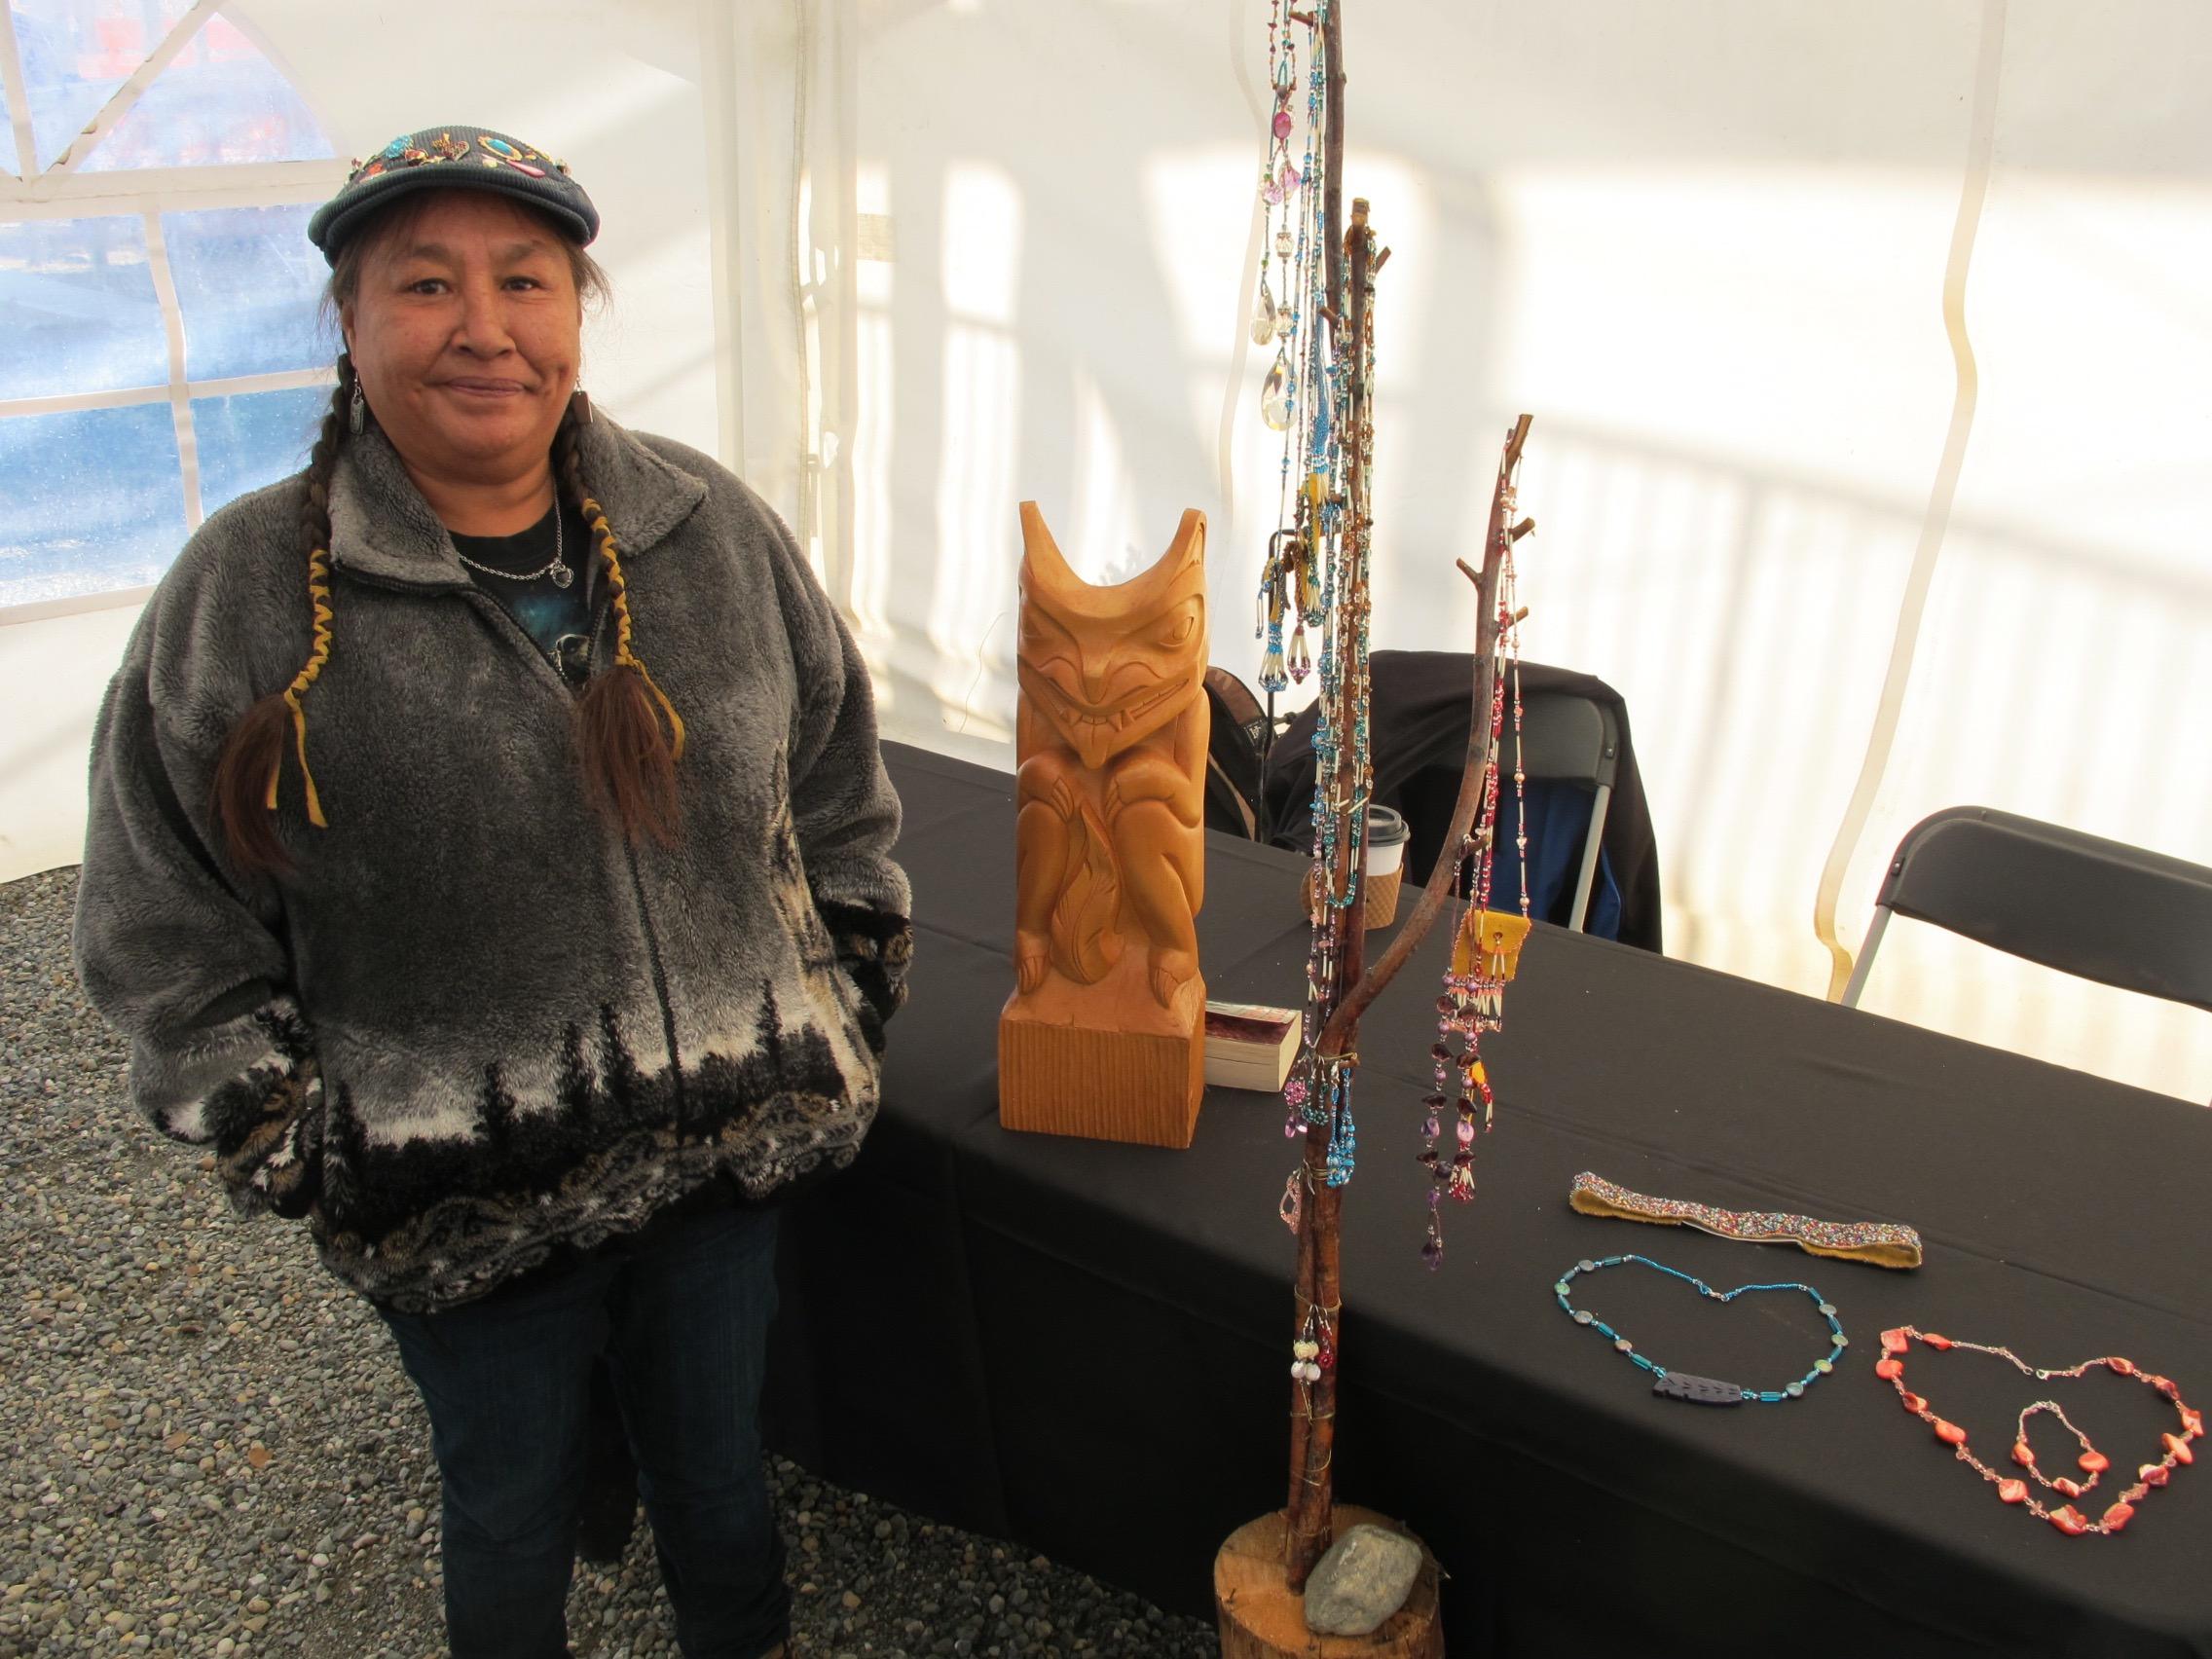 Marie Jack, Porcupine Jewellery